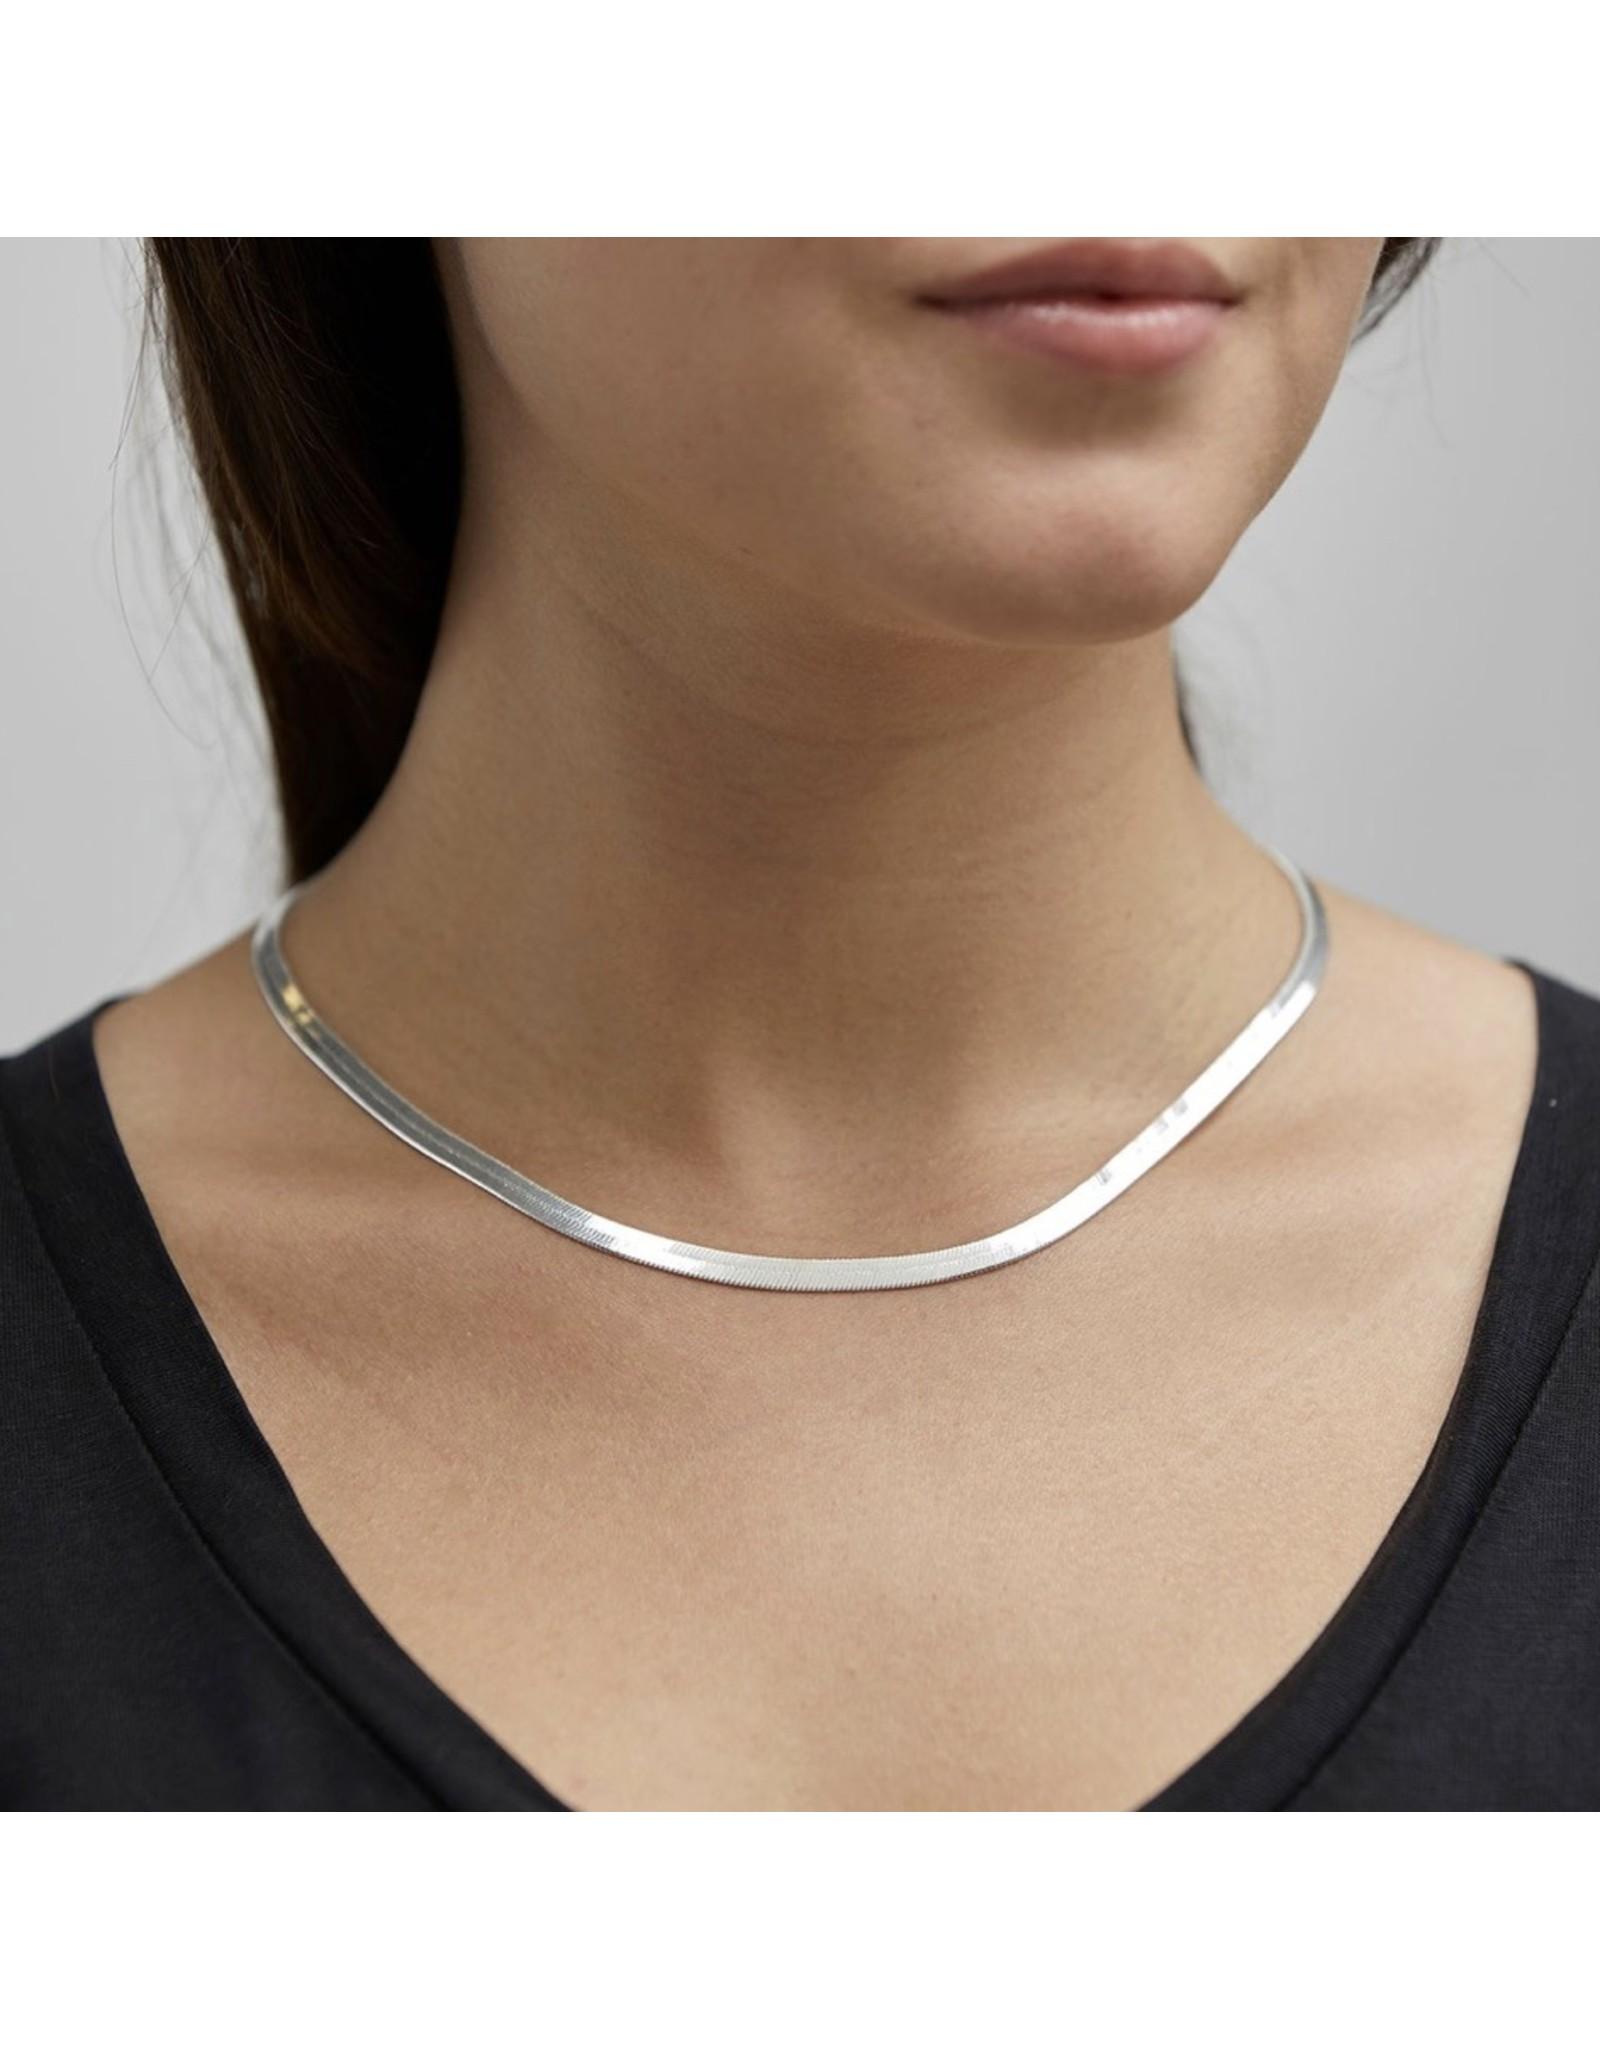 Pilgrim Pilgrim Necklace, Noreen, Silver Plated